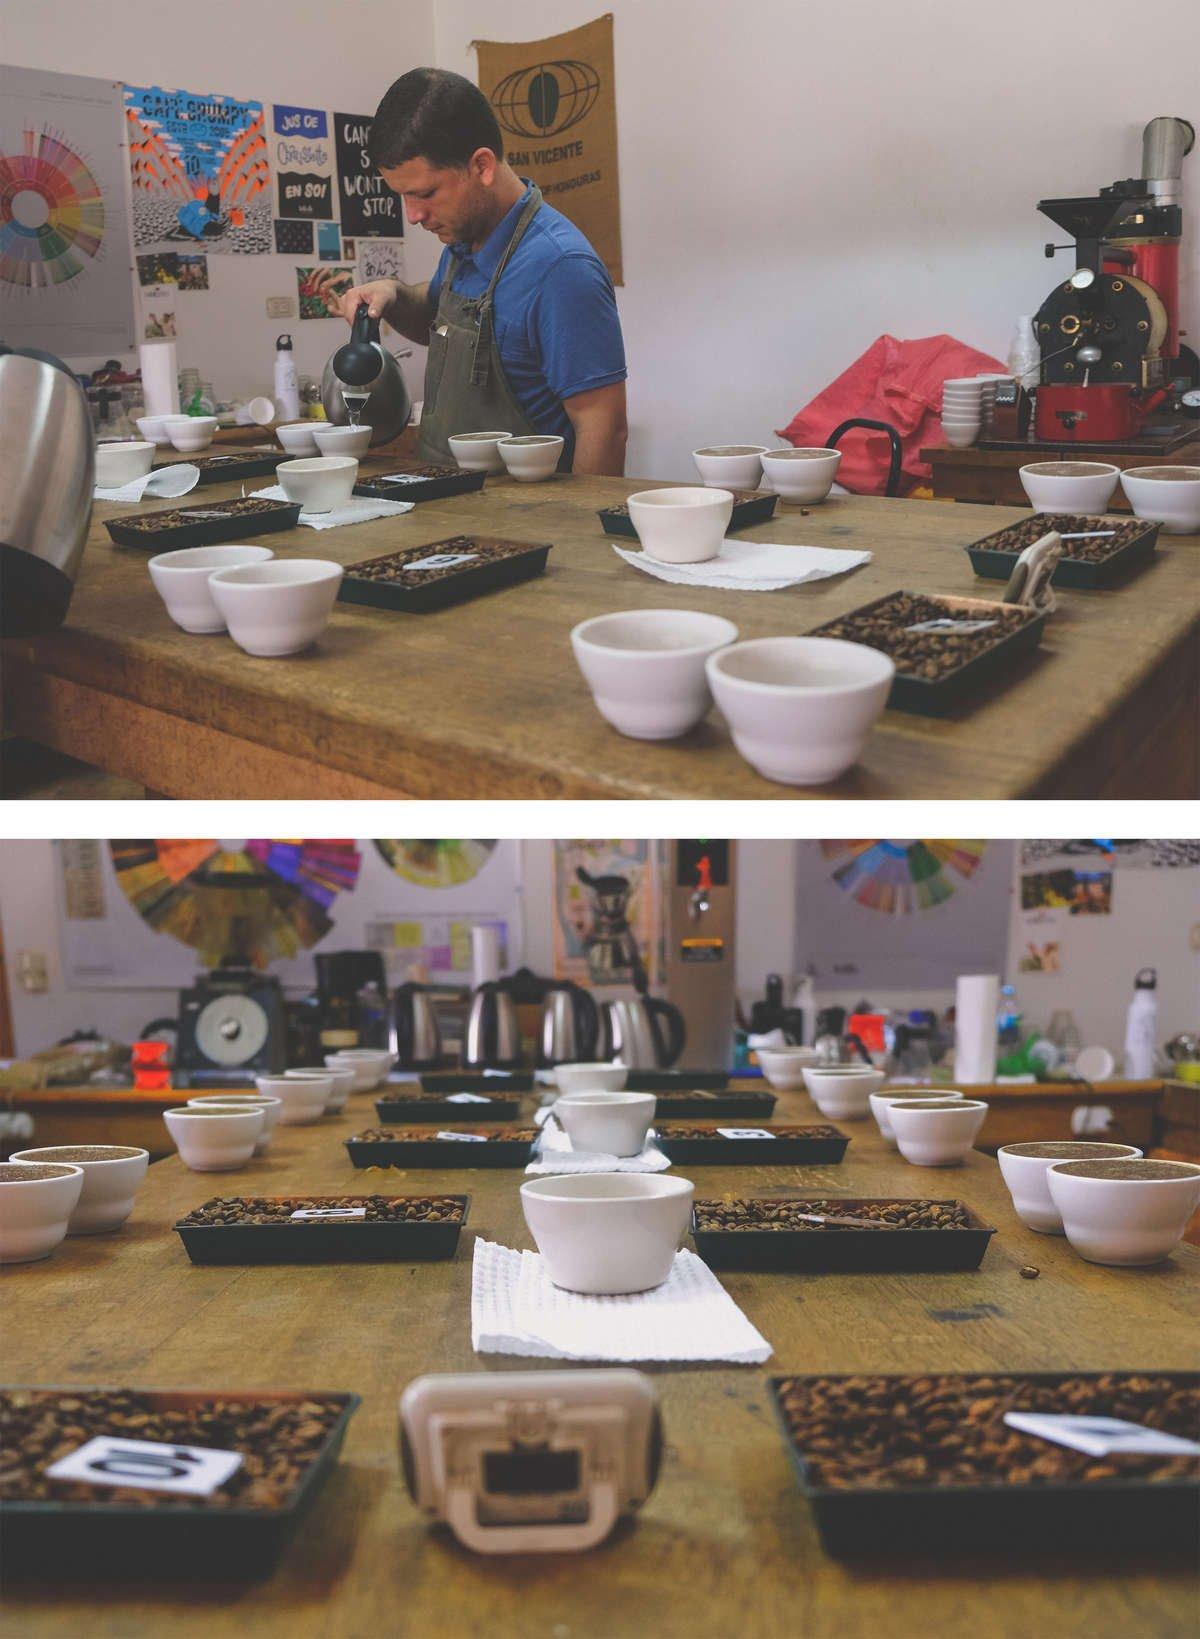 Honduras coffee, Case Coffee Roasters